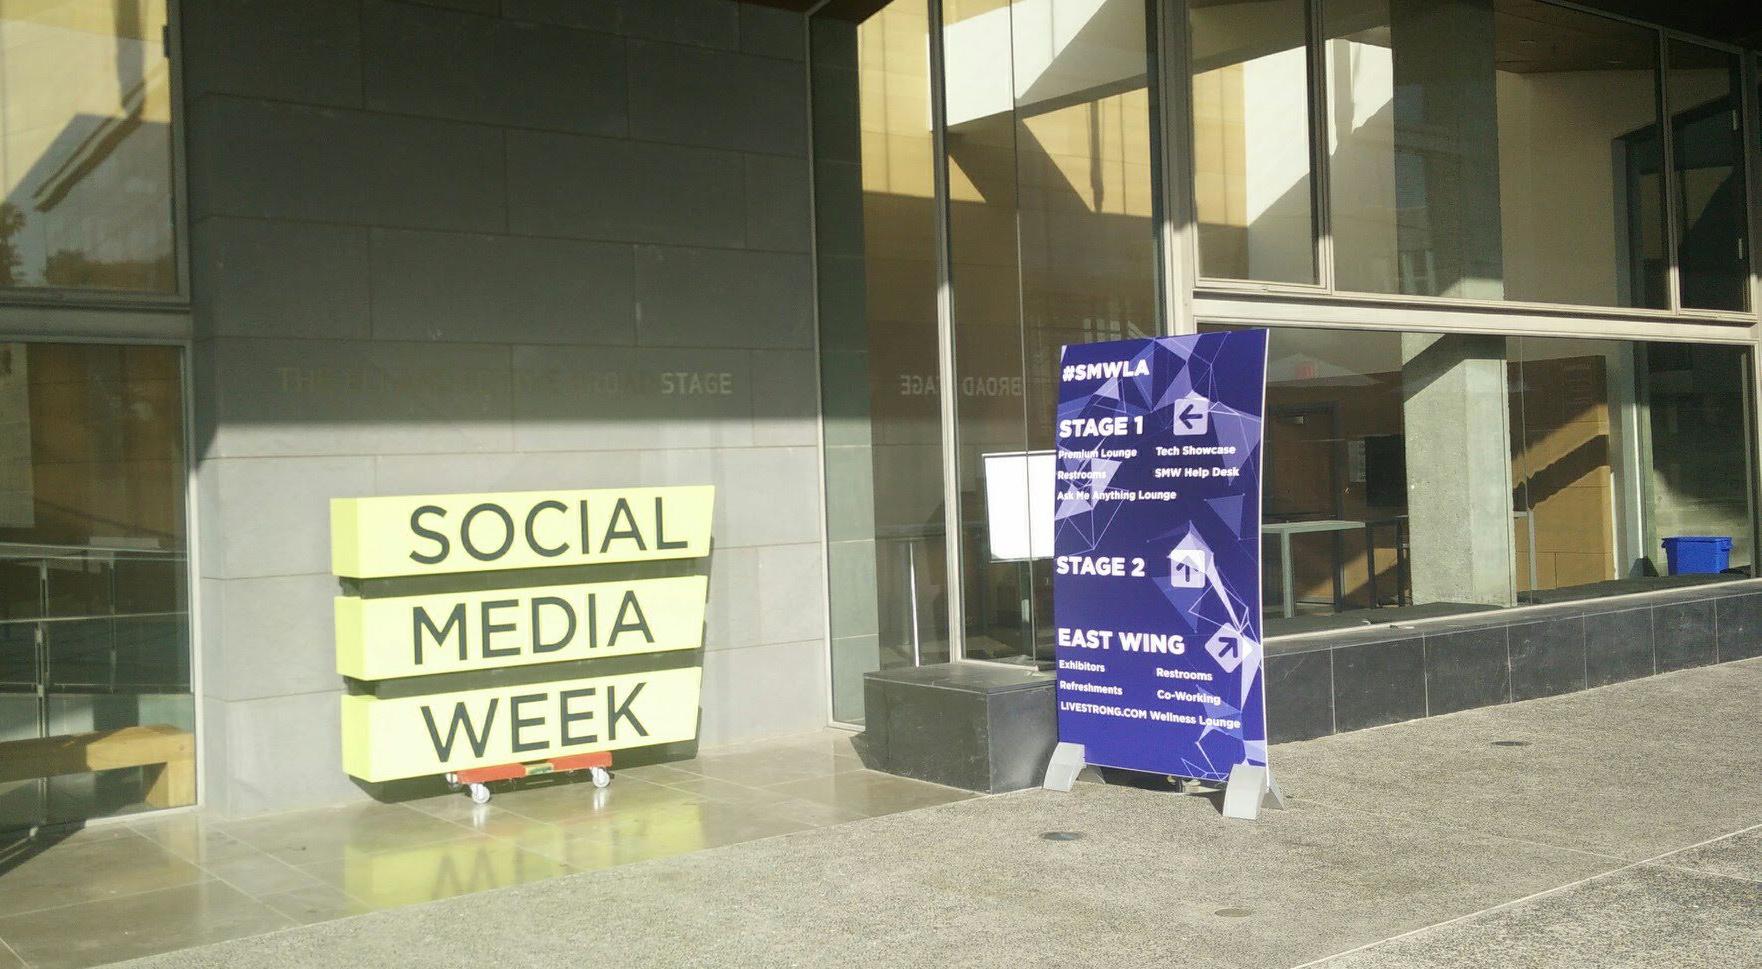 social media week in LA